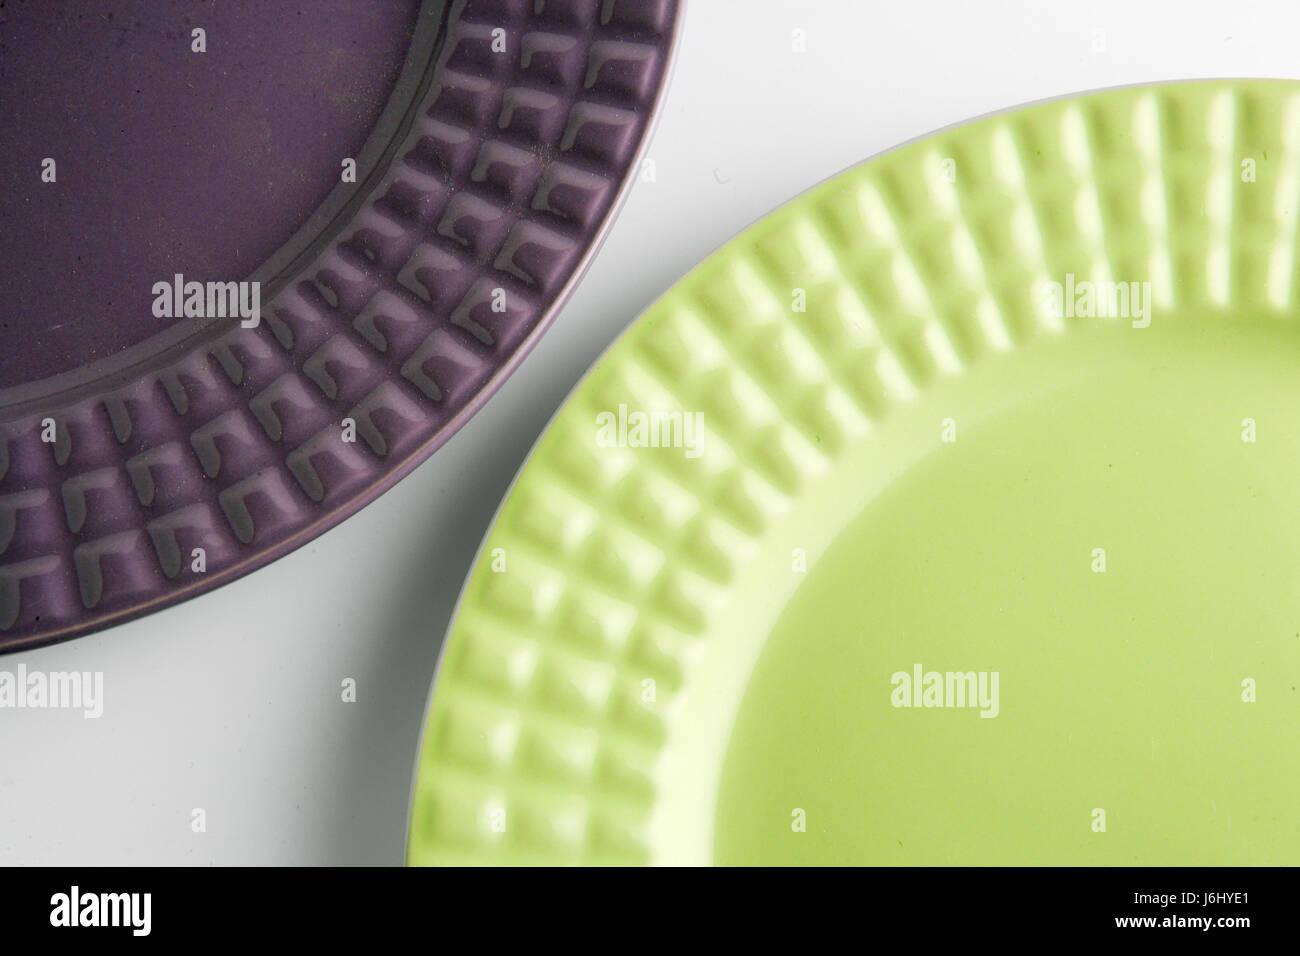 horizontal,violet,plates,two,green,2 plates,kitchen items,white background - Stock Image